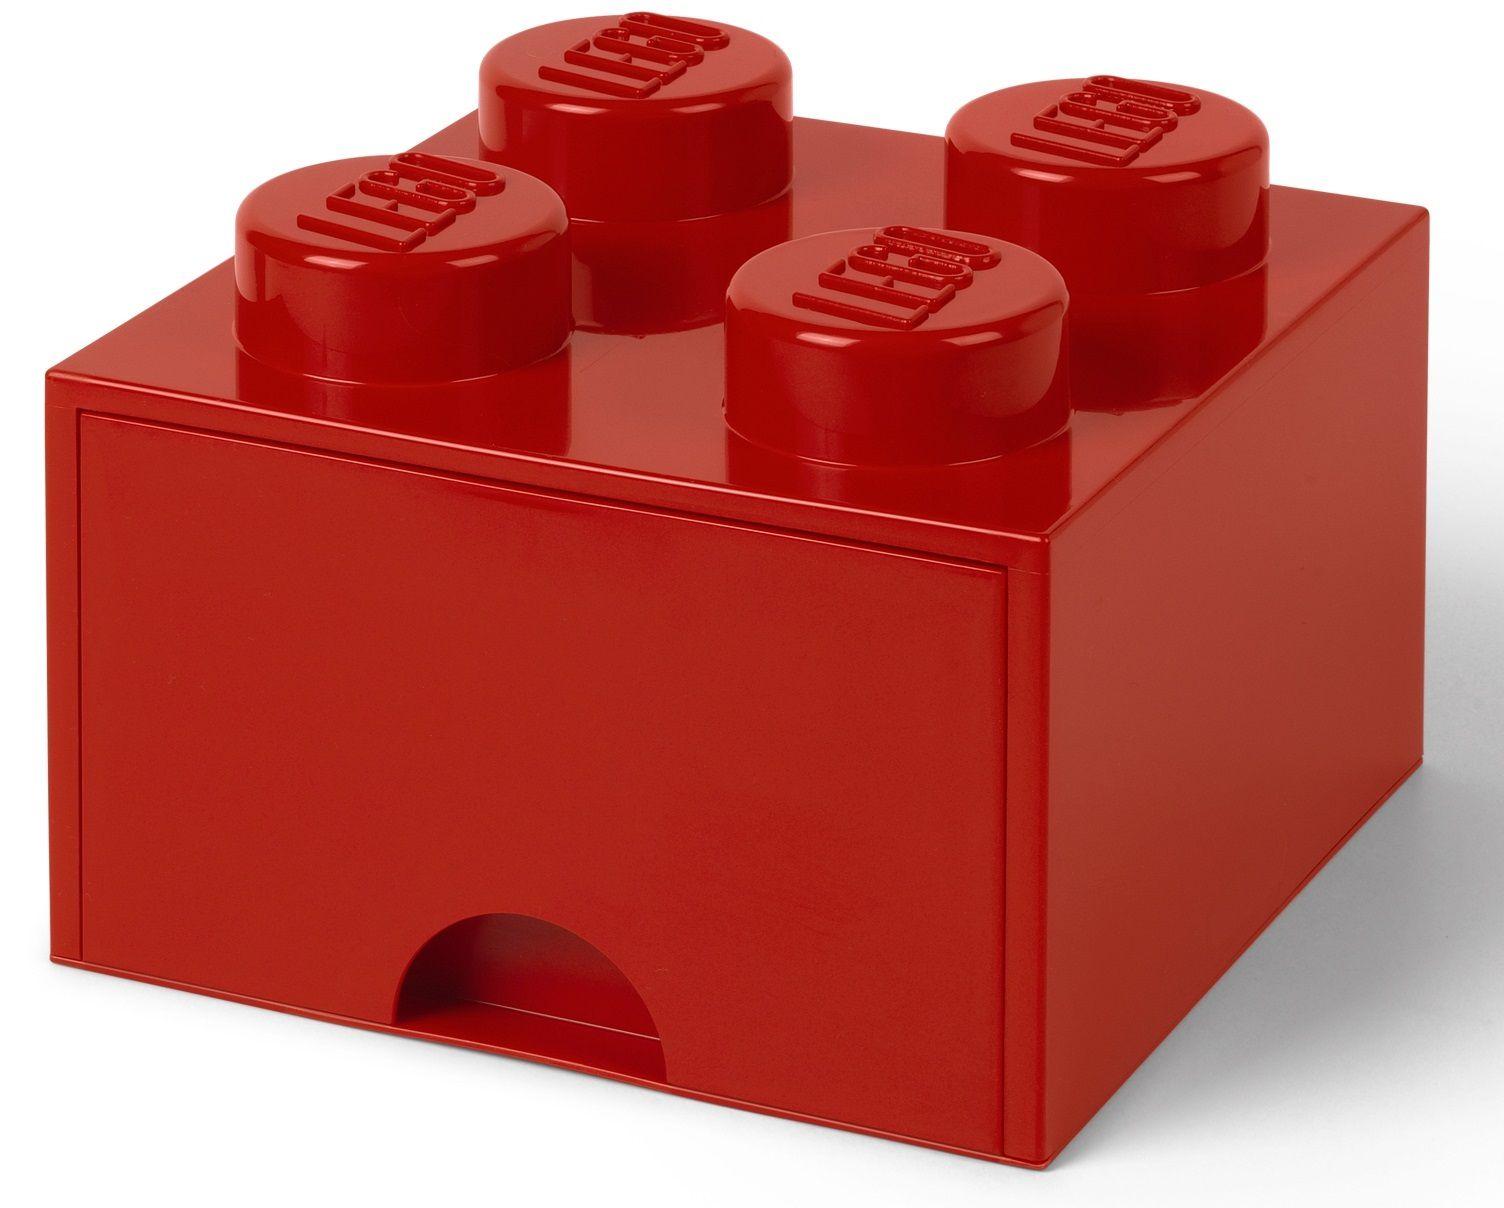 lego_opbergbox_met_lade_rood.jpg